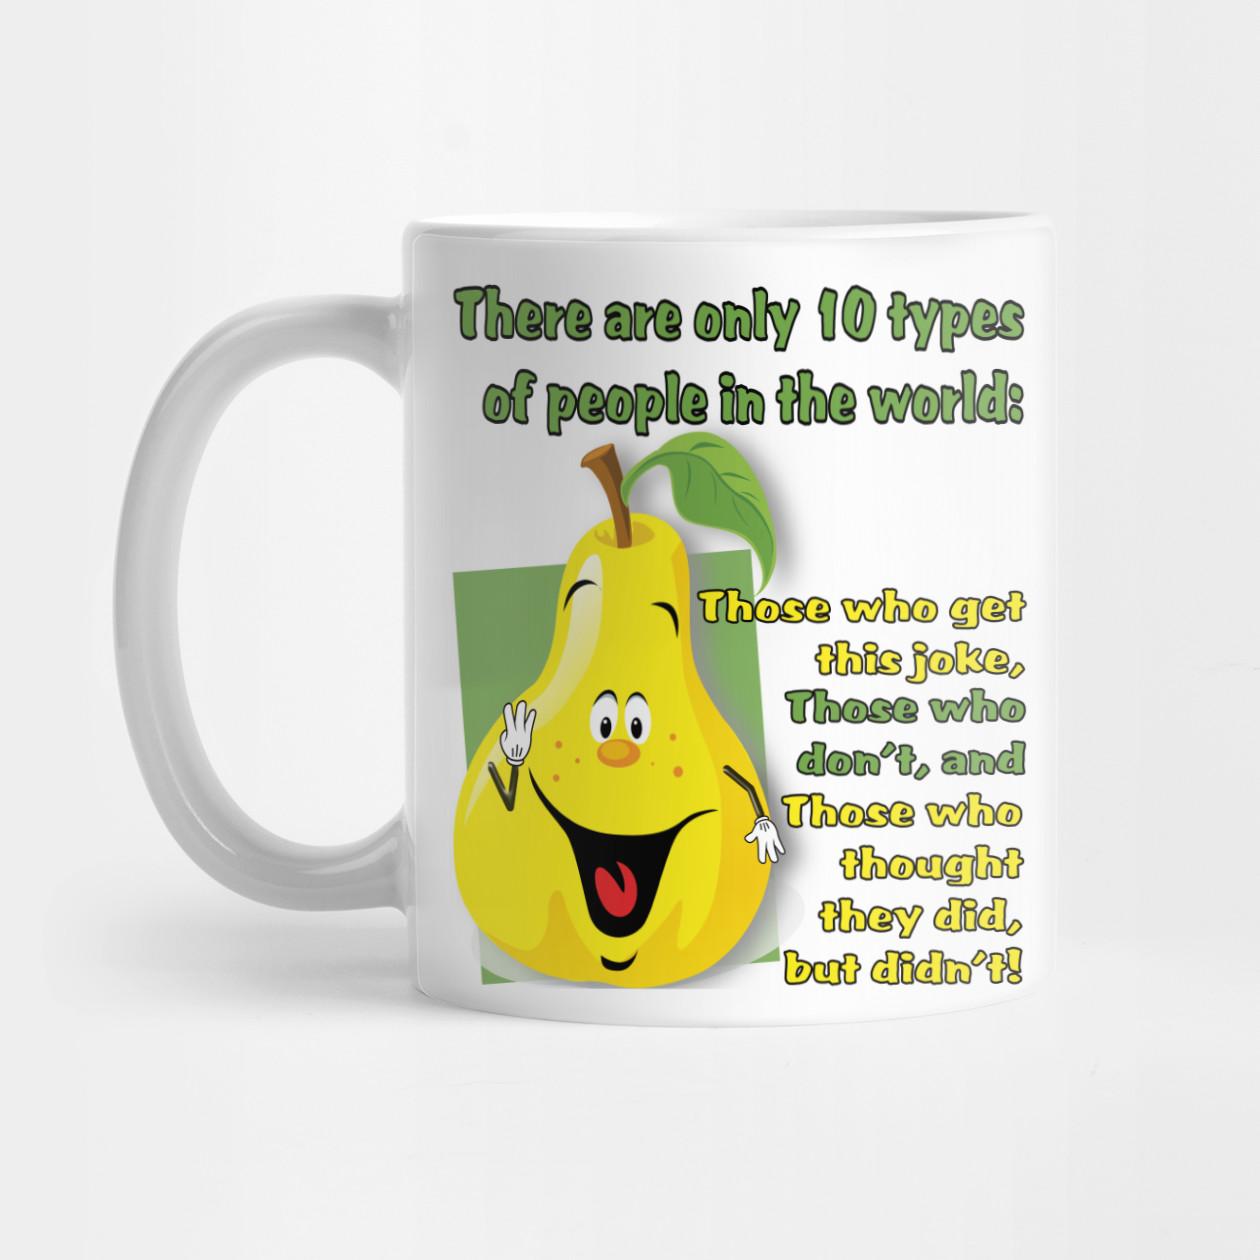 10-types-of-people-mug